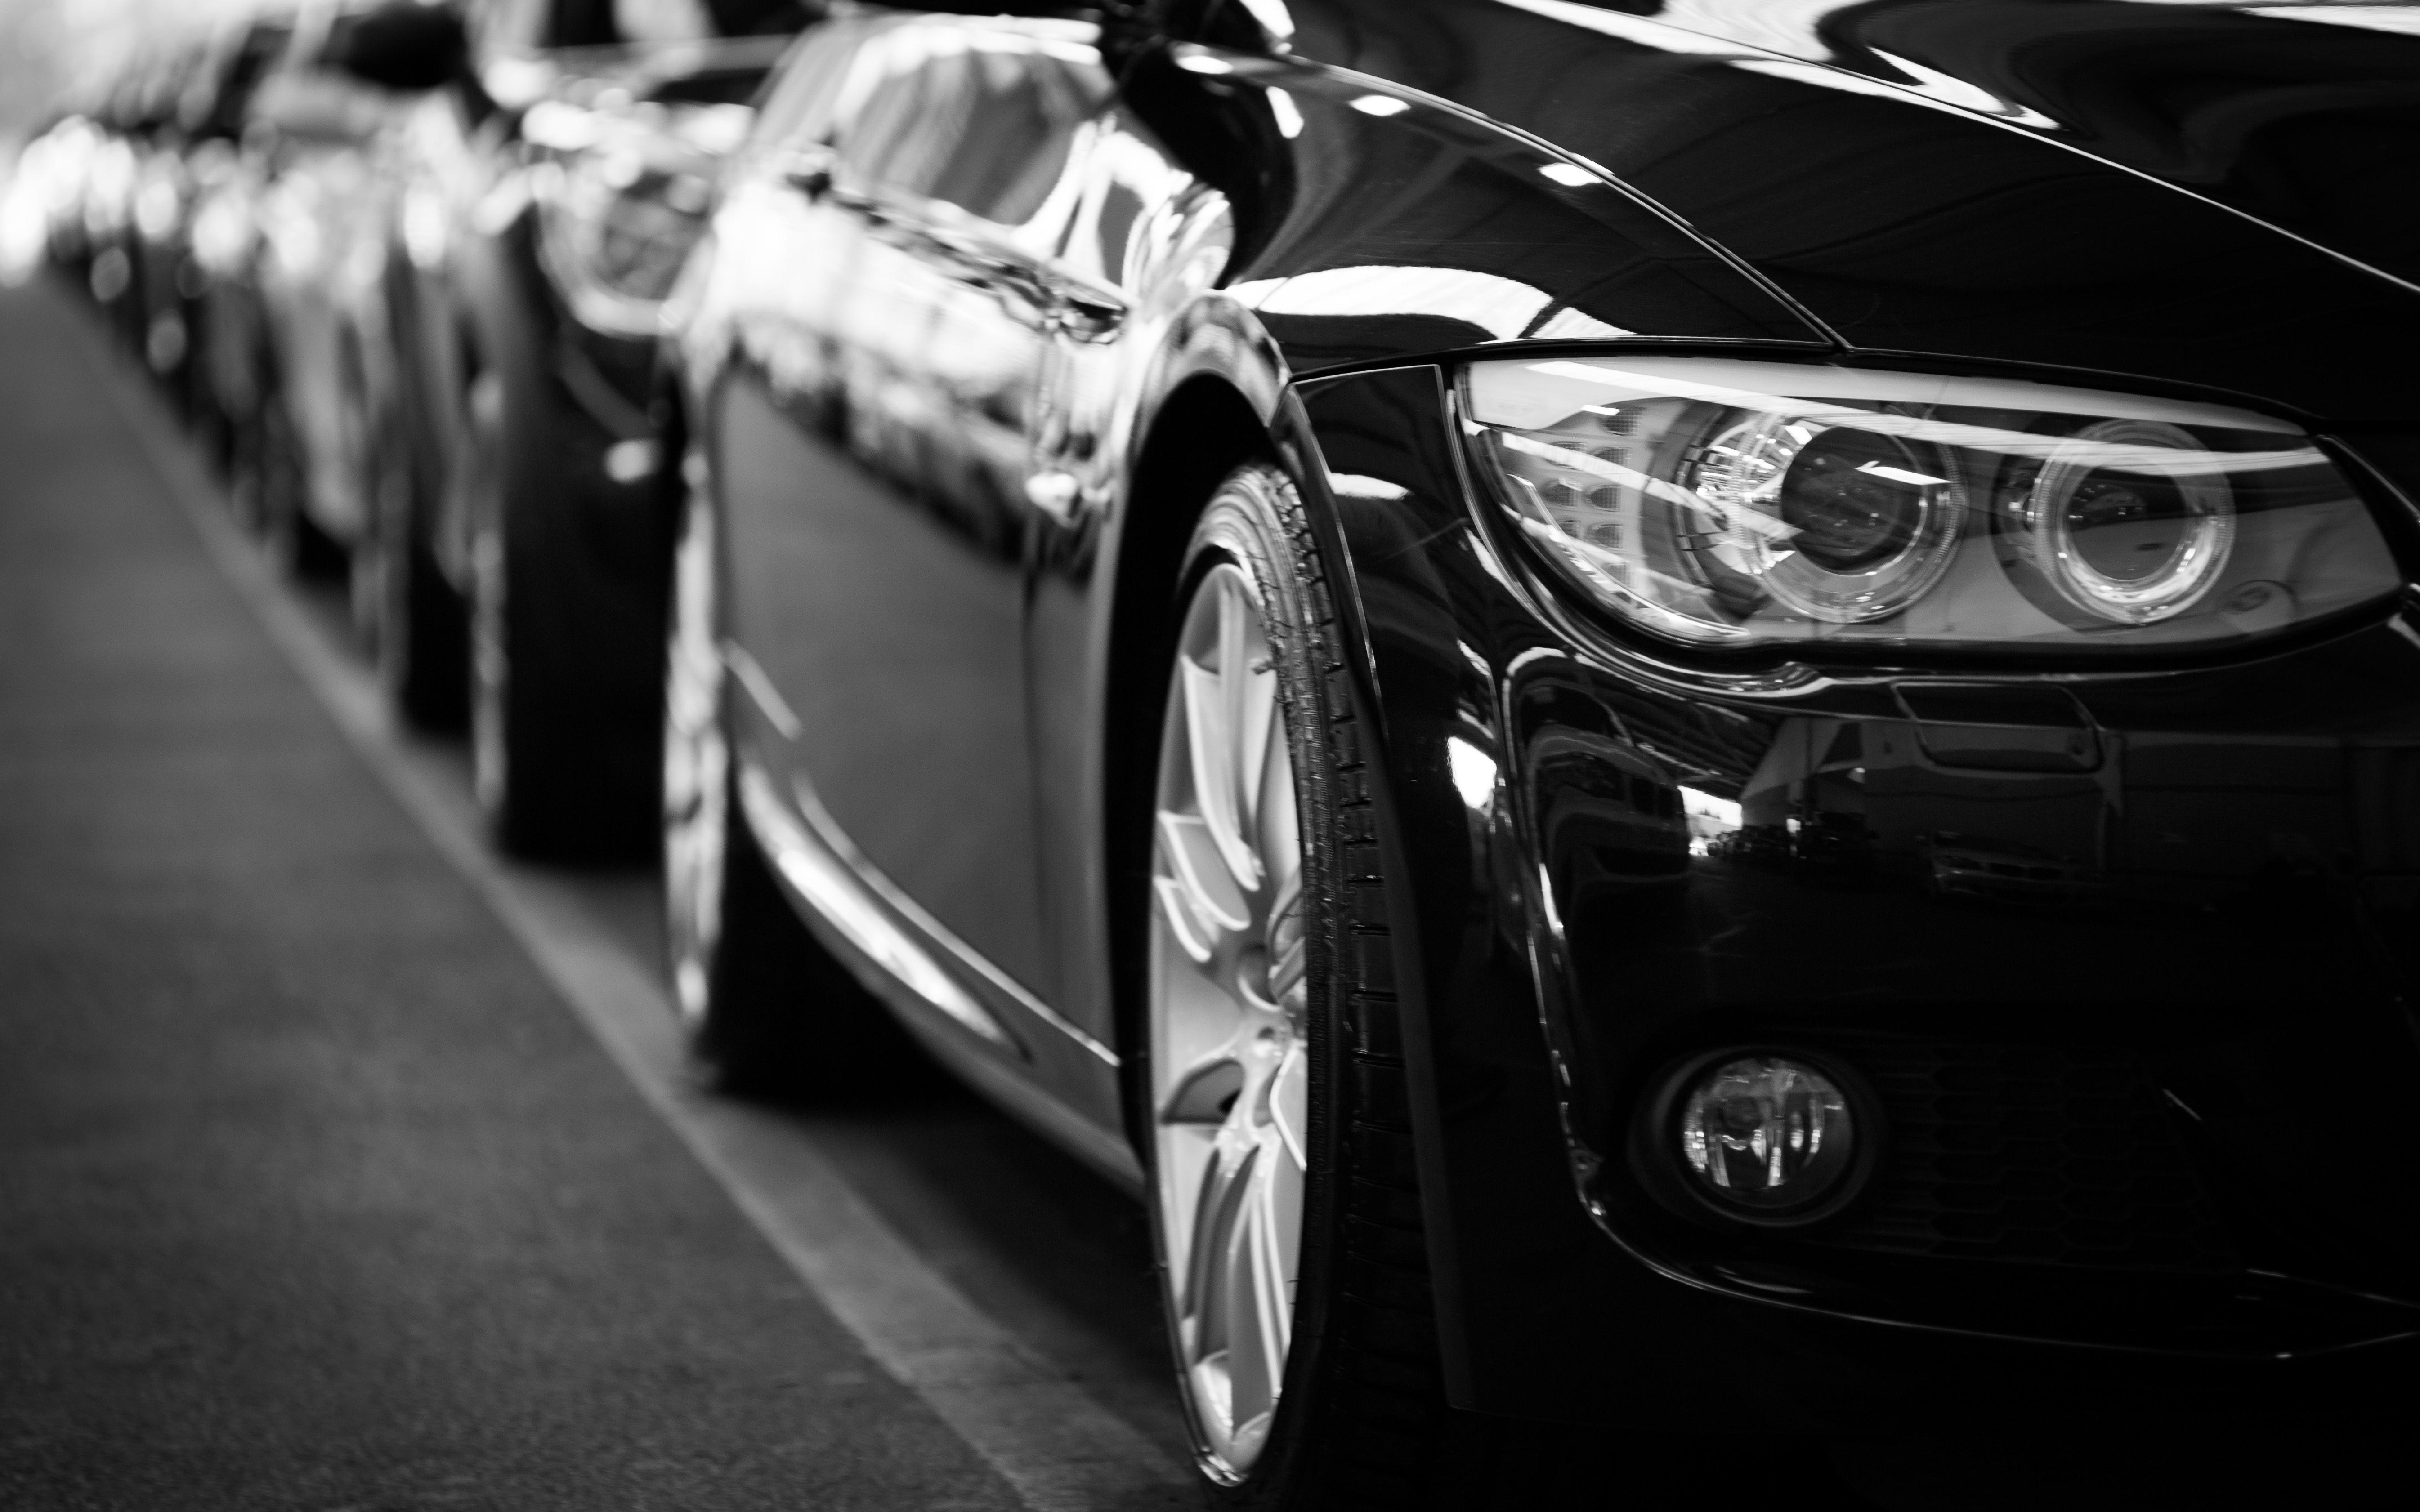 Black Coupes Free Stock Photo